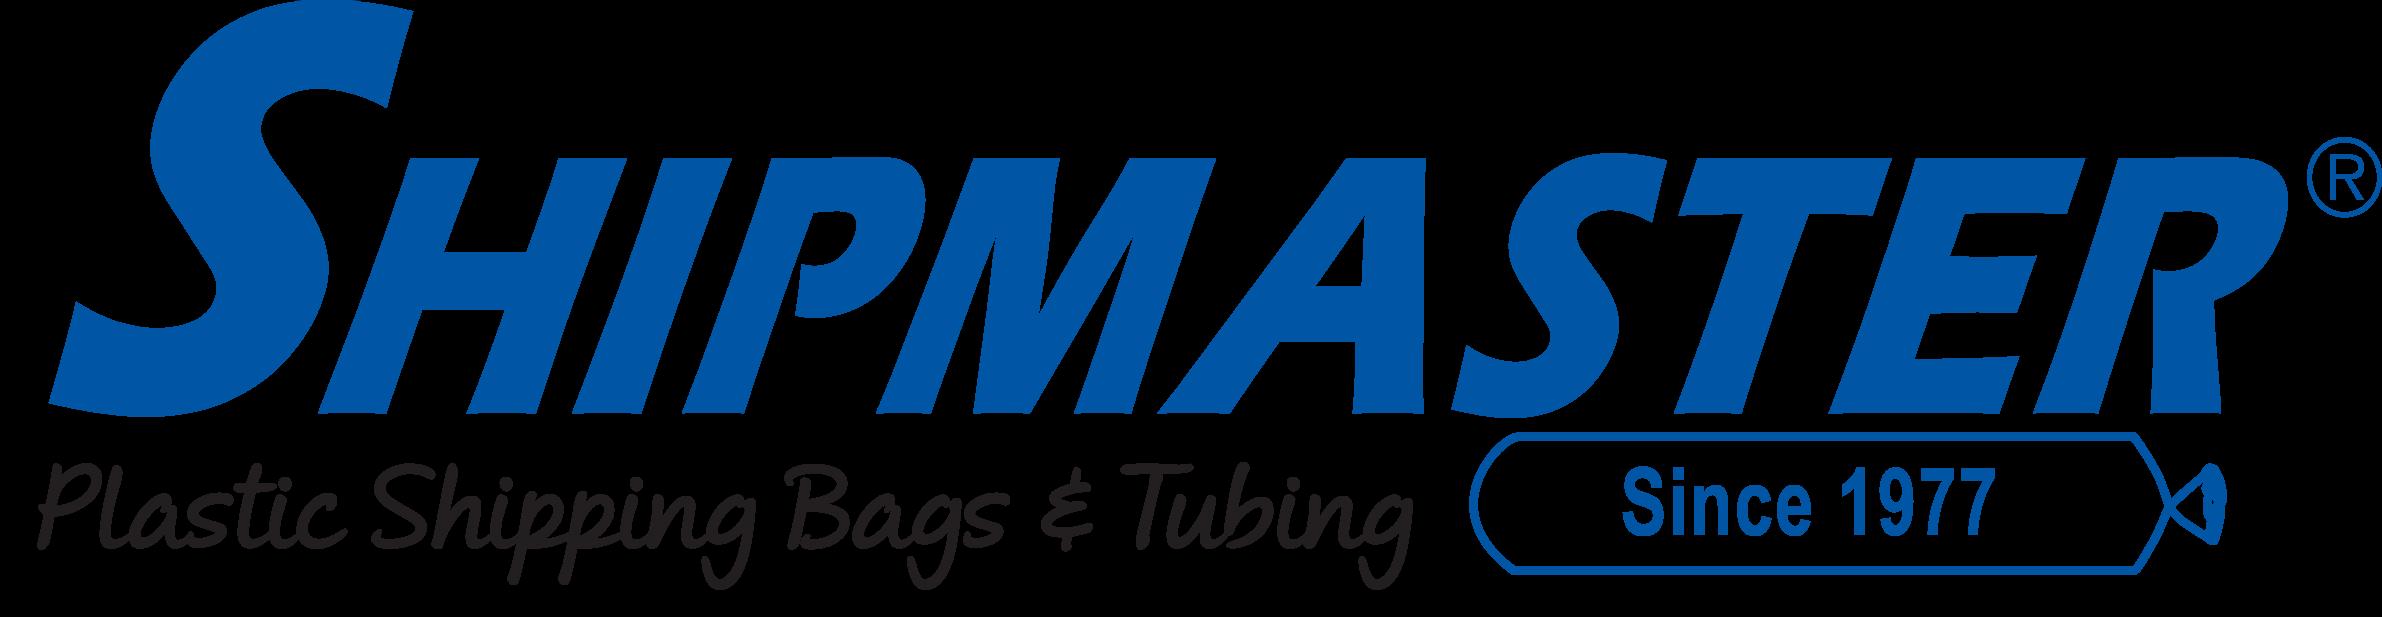 Shipmaster Plastic Bags & Tubing